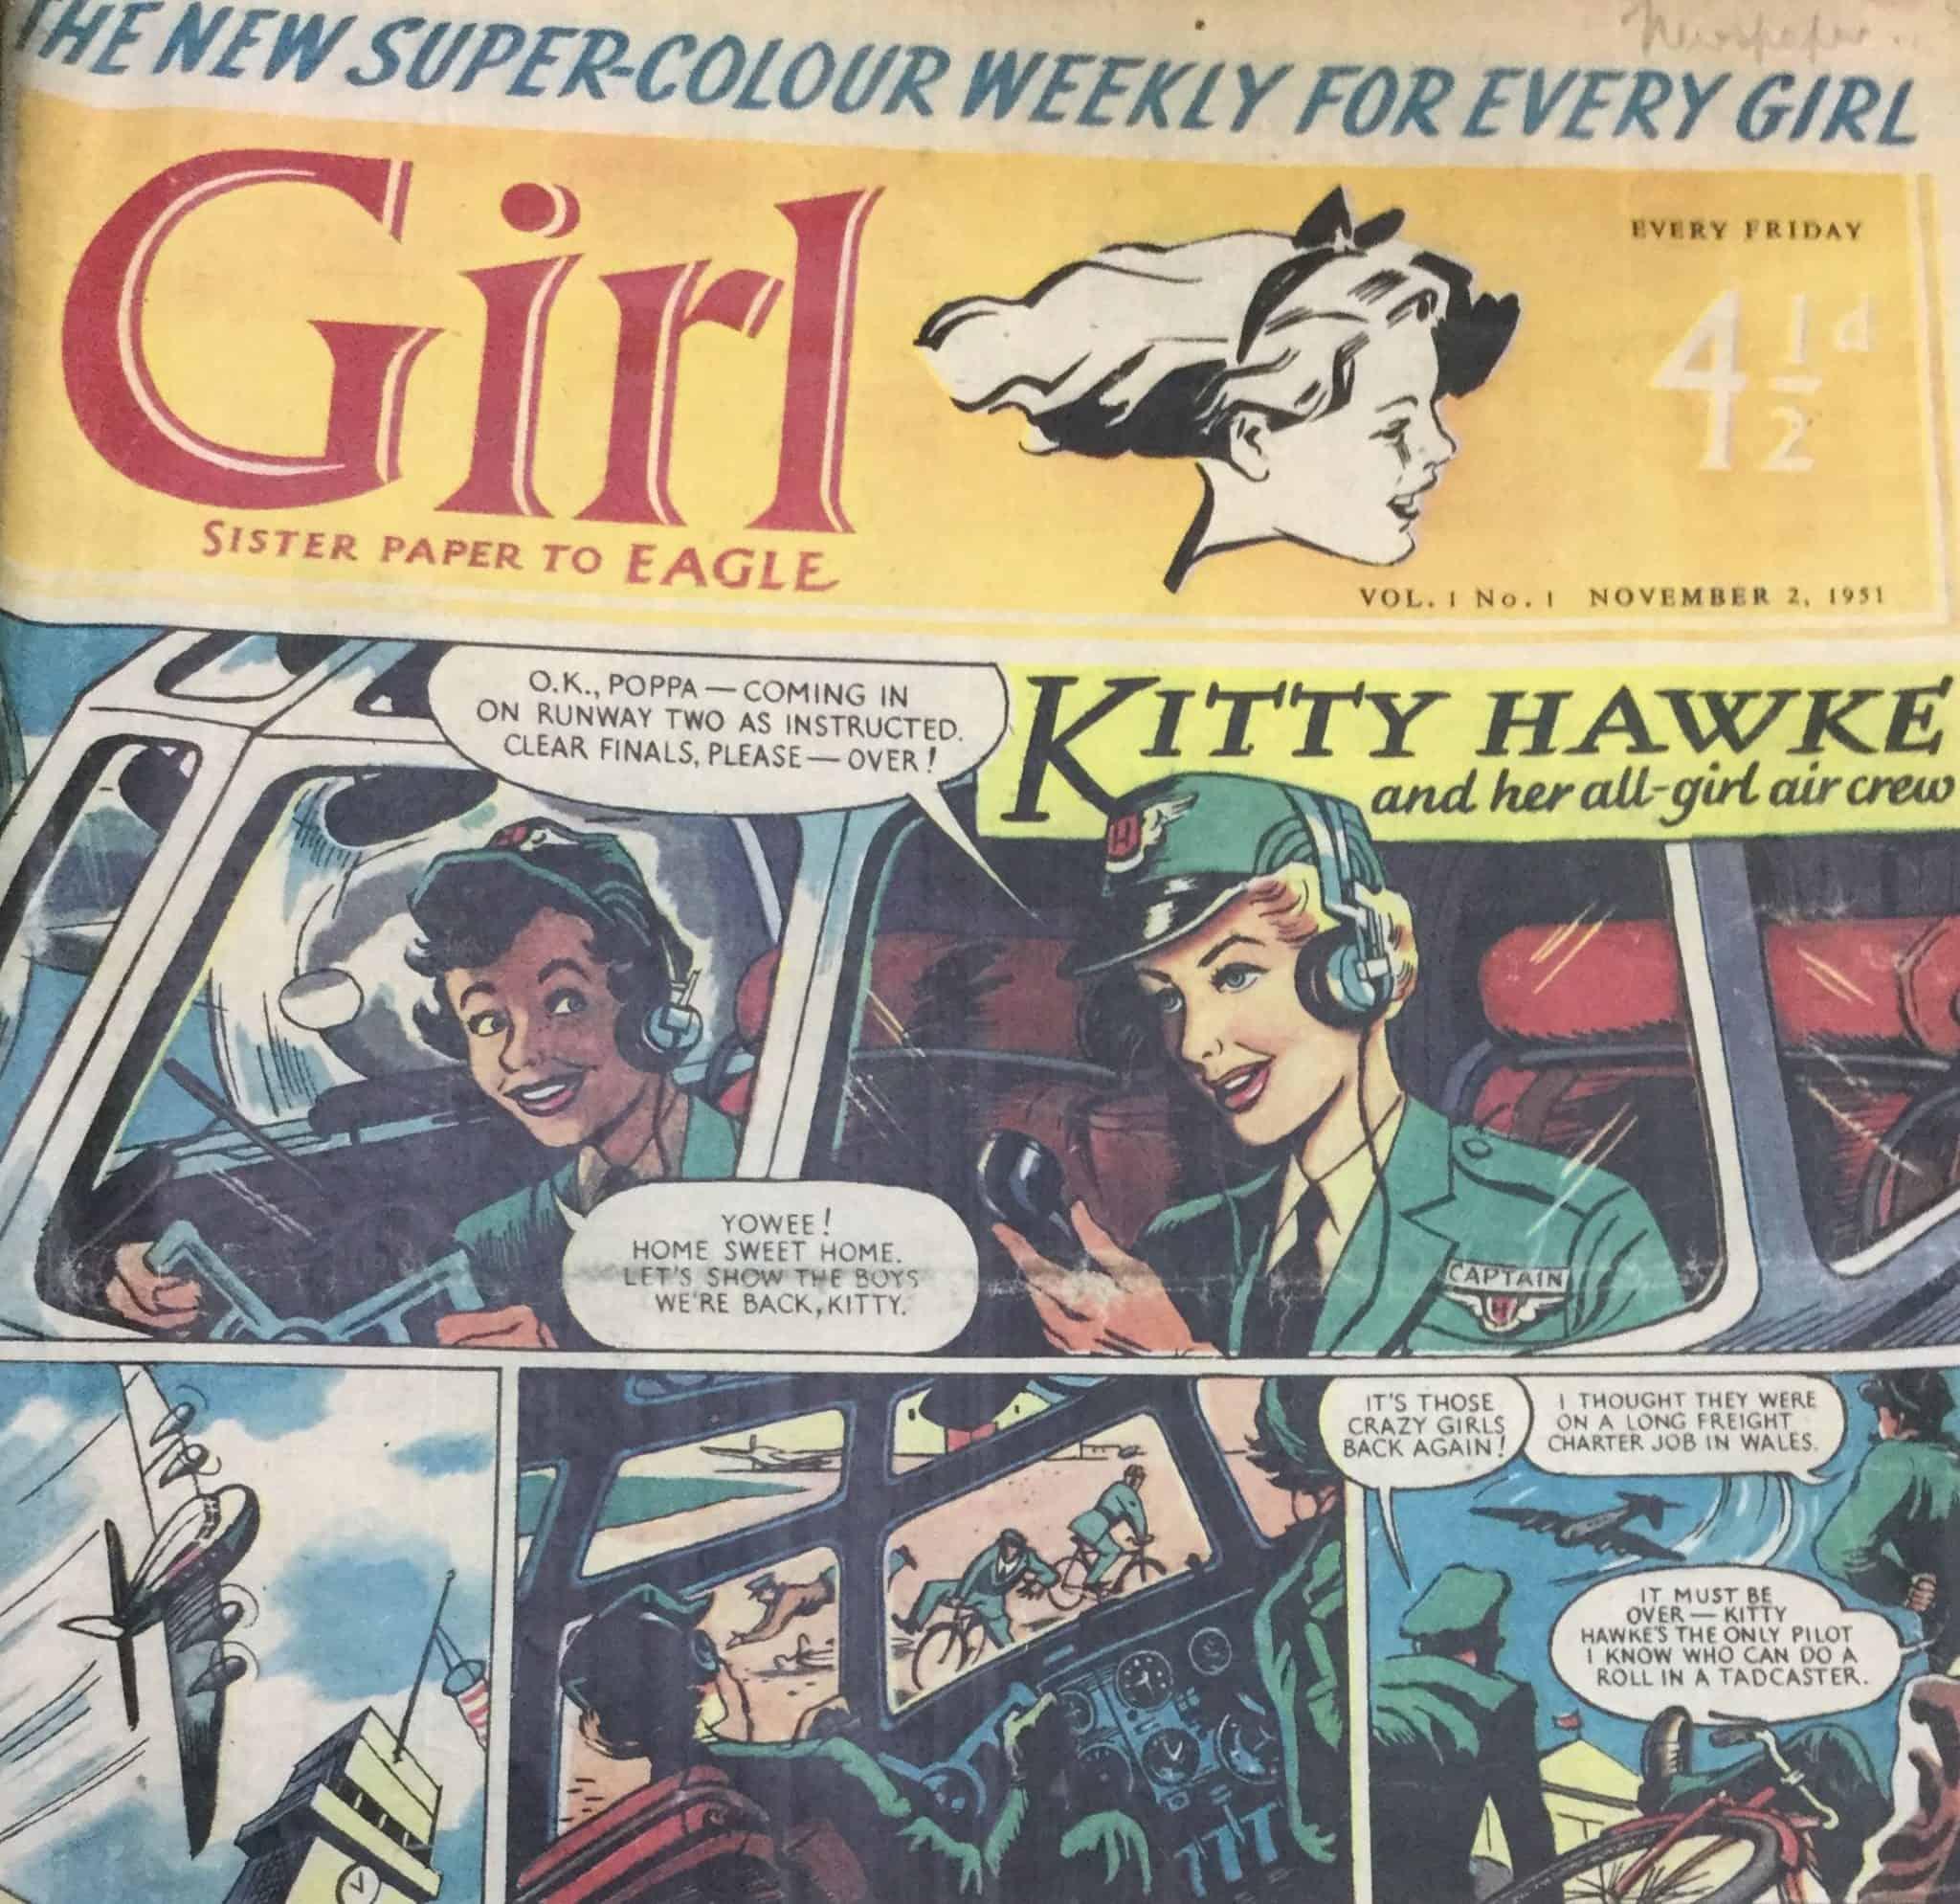 Girl, קיטי הוק, טייסת, נשים